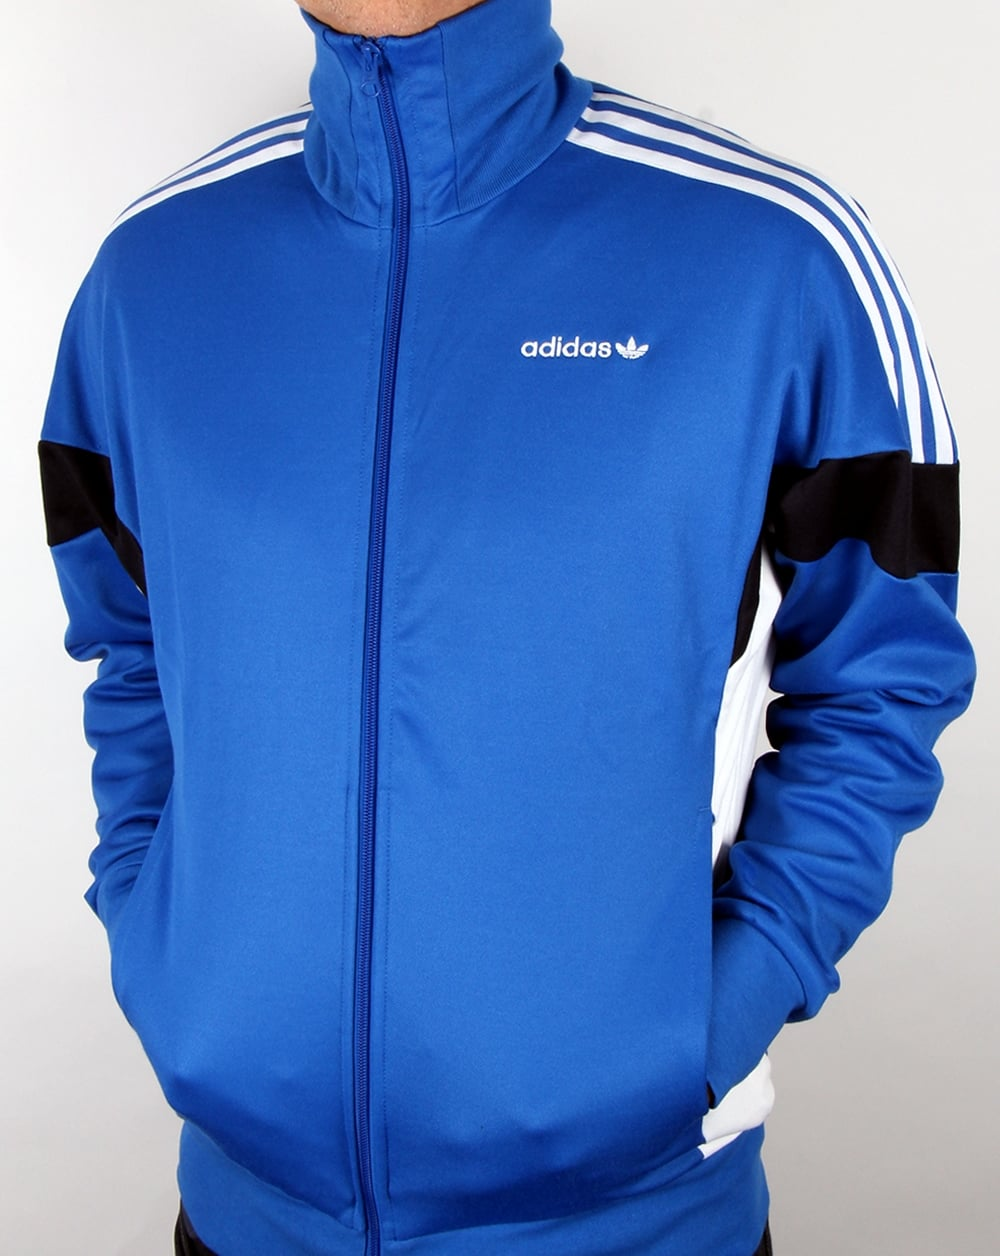 Adidas Top Ten Hi Sleek Bow Zip Trainers: Adidas Originals Clr84 Track Top Blue, Men's, Jacket